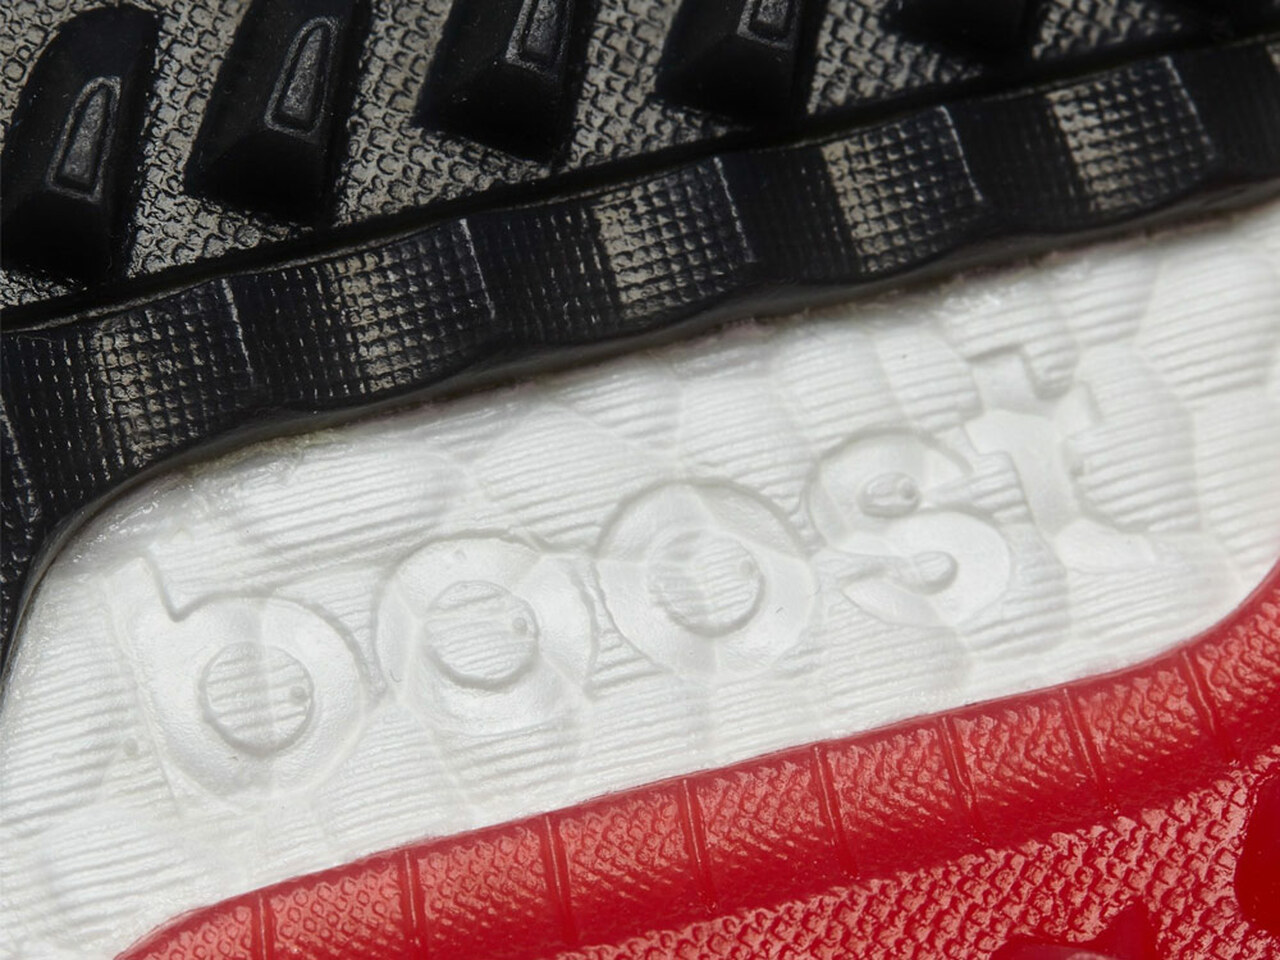 nouvelle arrivee 4259d 34c4a Adidas Adipower S Boost 3 Golf Shoes - Onix/C Black/Scarlet